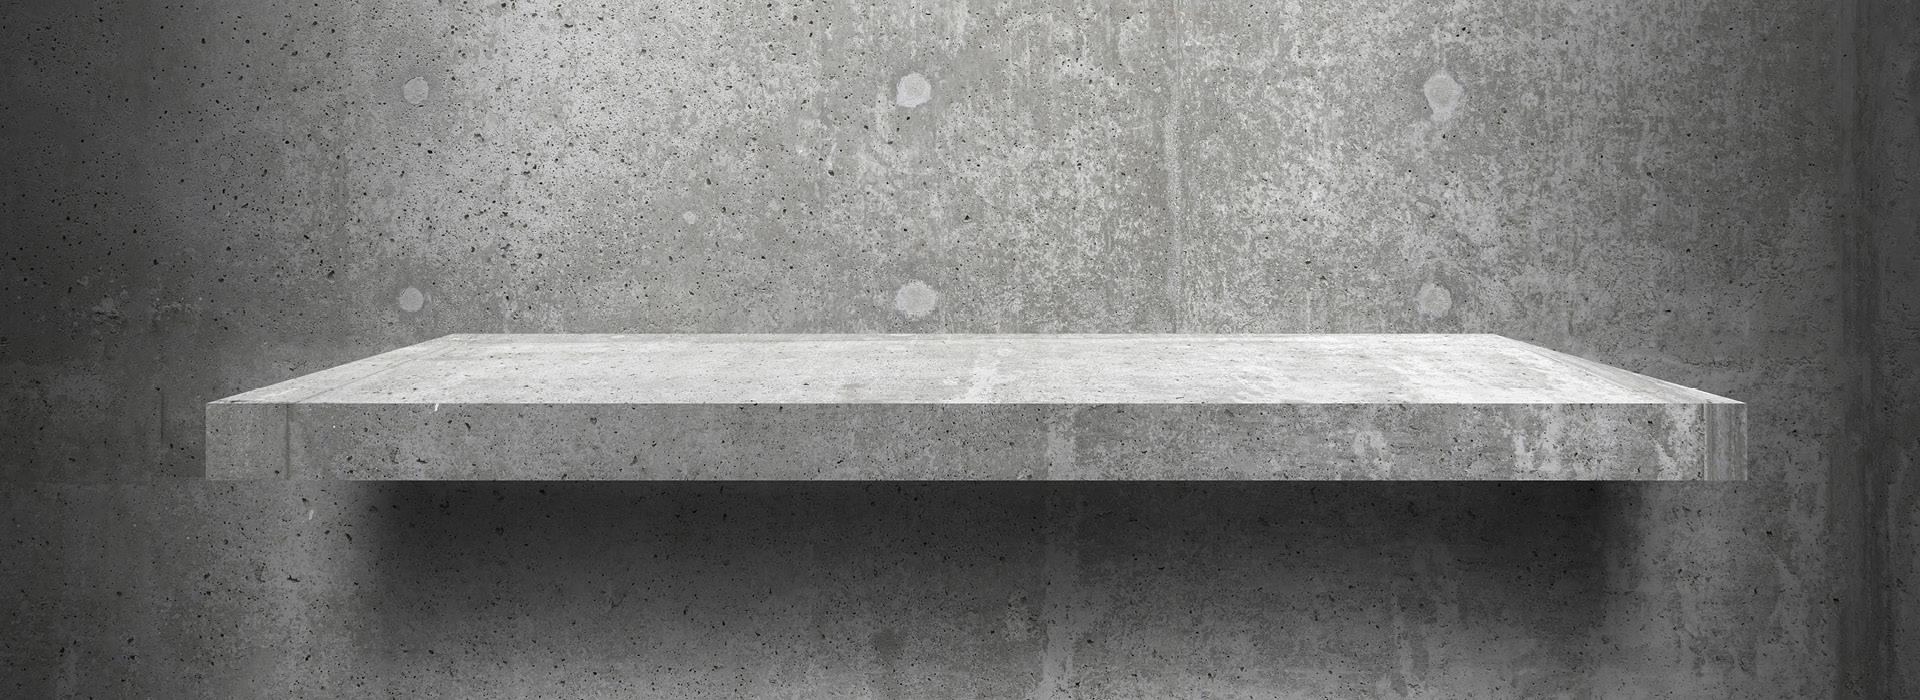 Beton Bank Beton Podest grau marmoriert